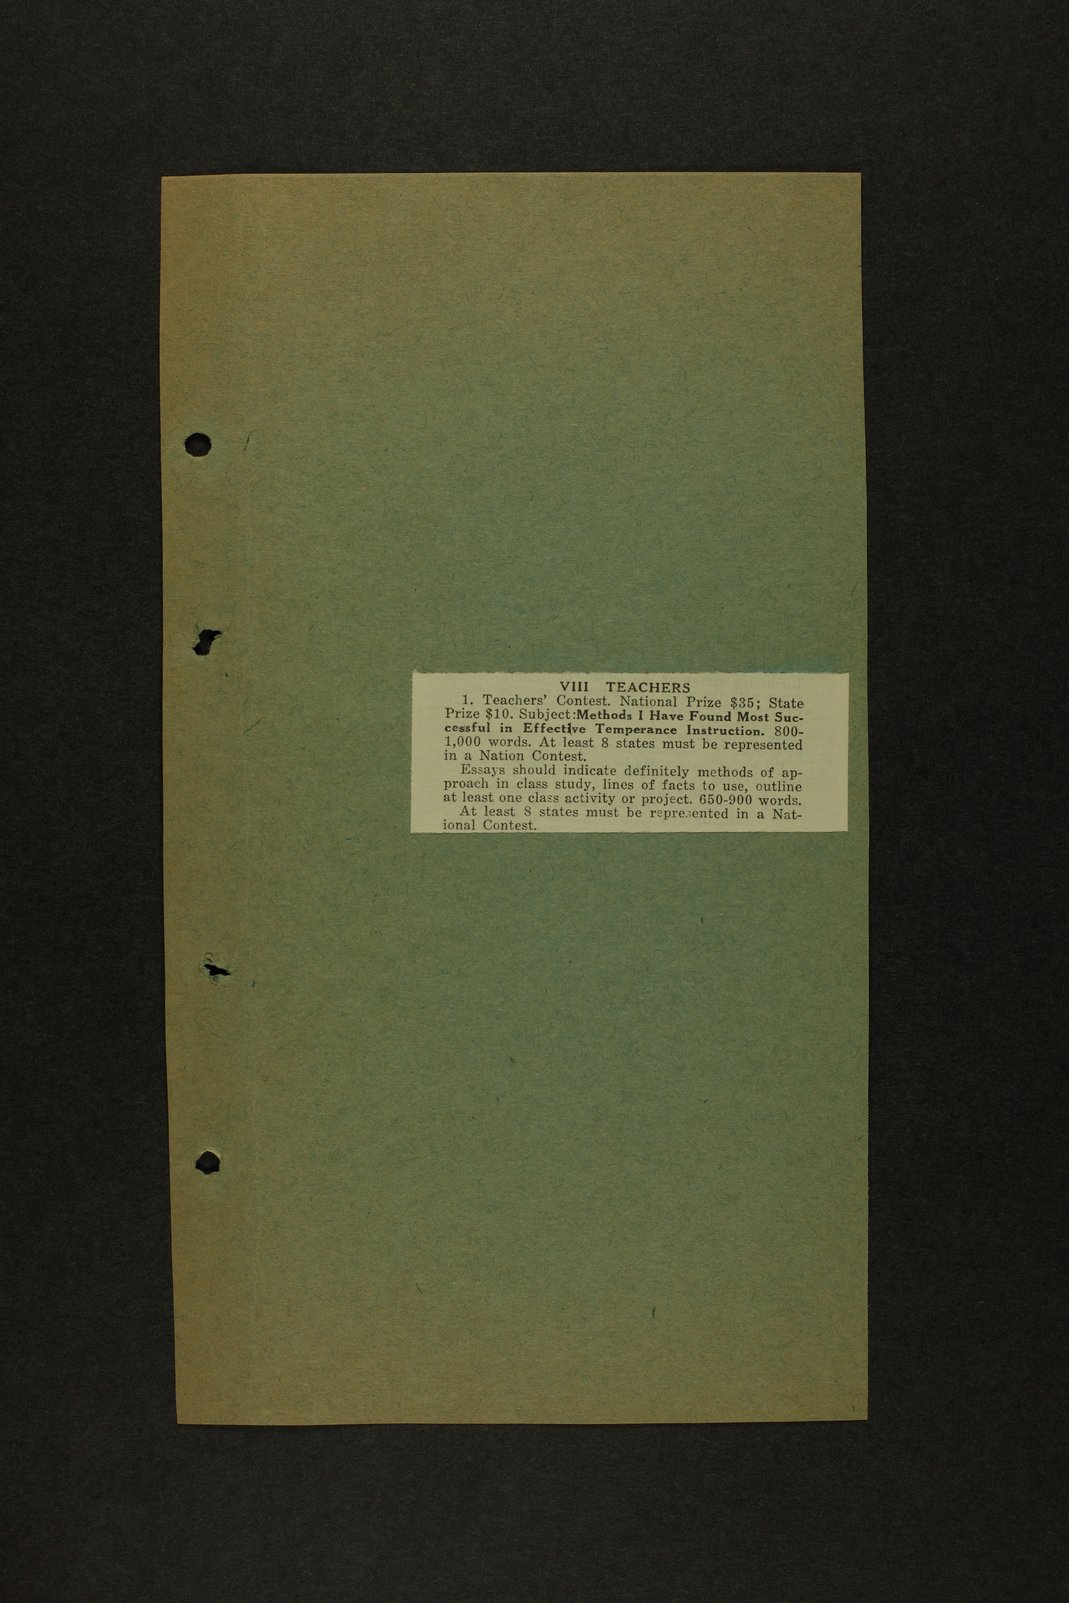 Kansas Woman's Christian Temperance Union permanent records - 2